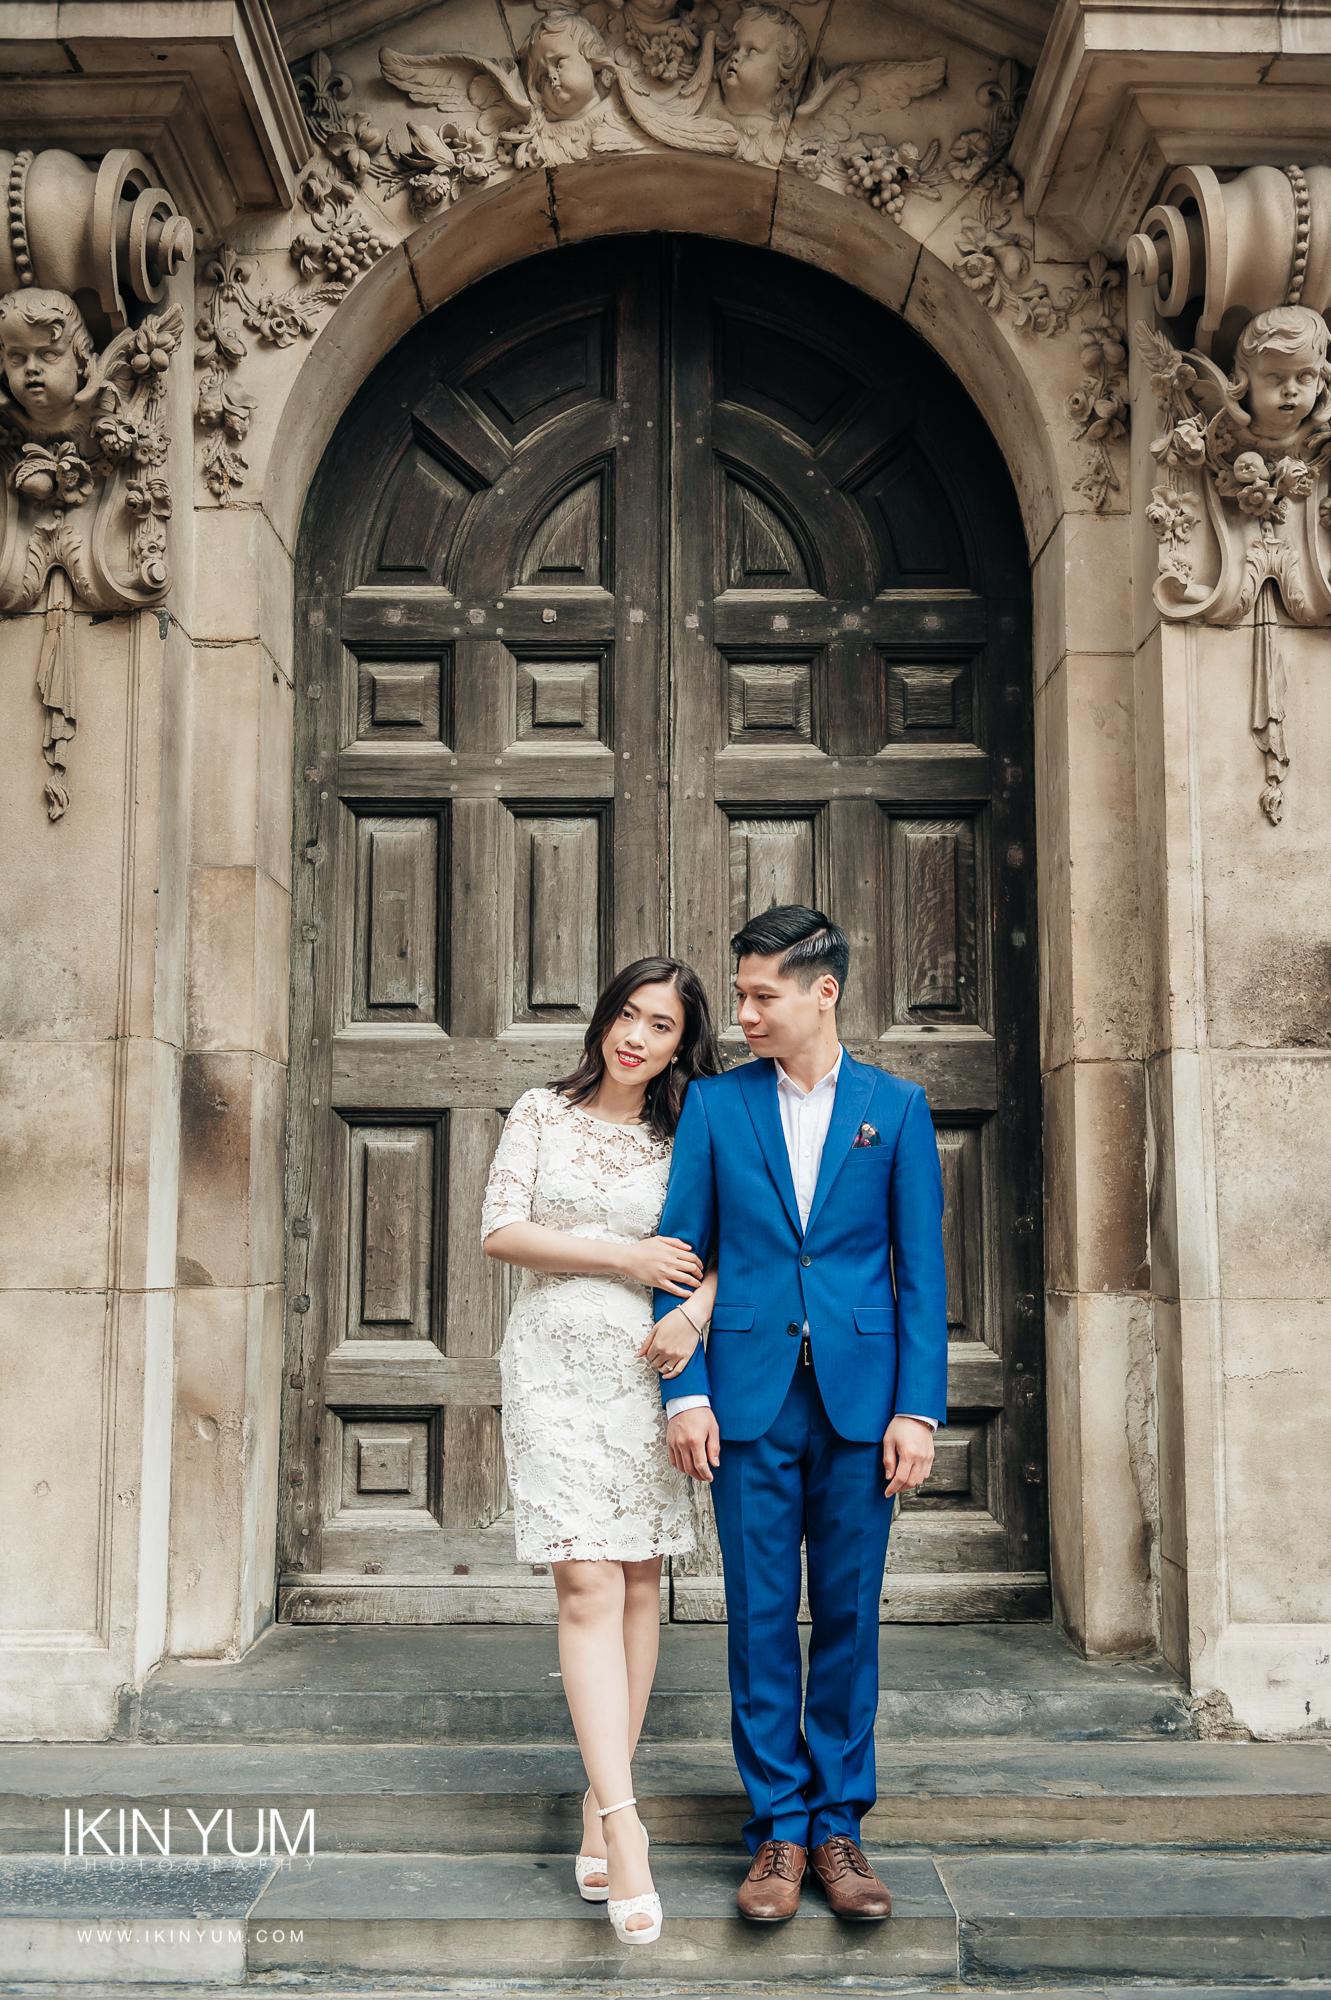 Natalie & Duncan Wedding Day - Ikin Yum Photography-094.jpg